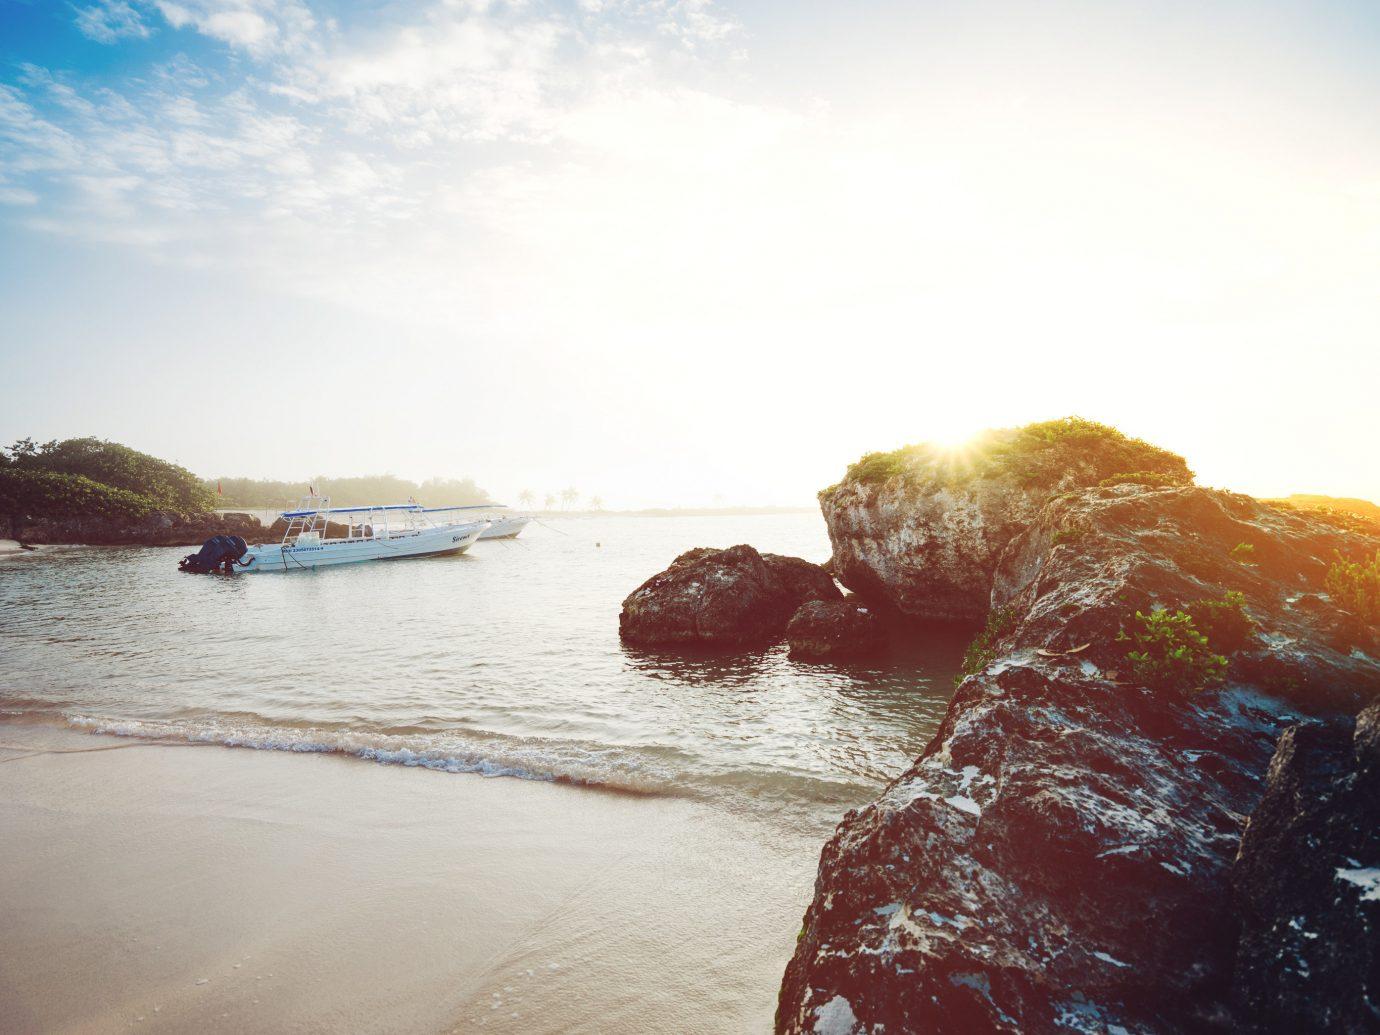 sky water outdoor Sea Ocean Beach wave shore reflection morning wind wave Coast sunlight Sunset vehicle sand